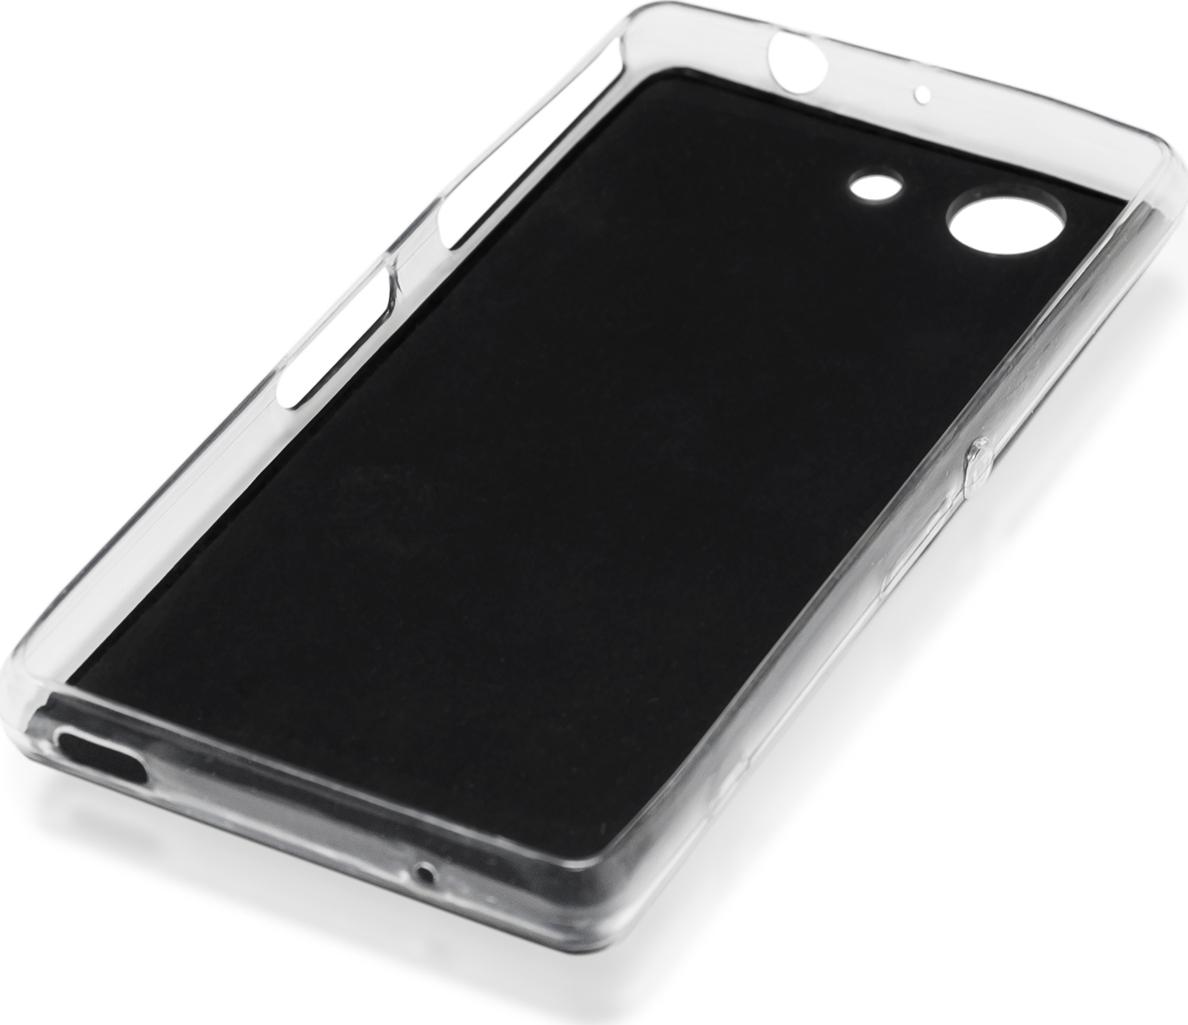 Чехол Brosco Leather TPU для Sony Xperia Z3 Compact, черный